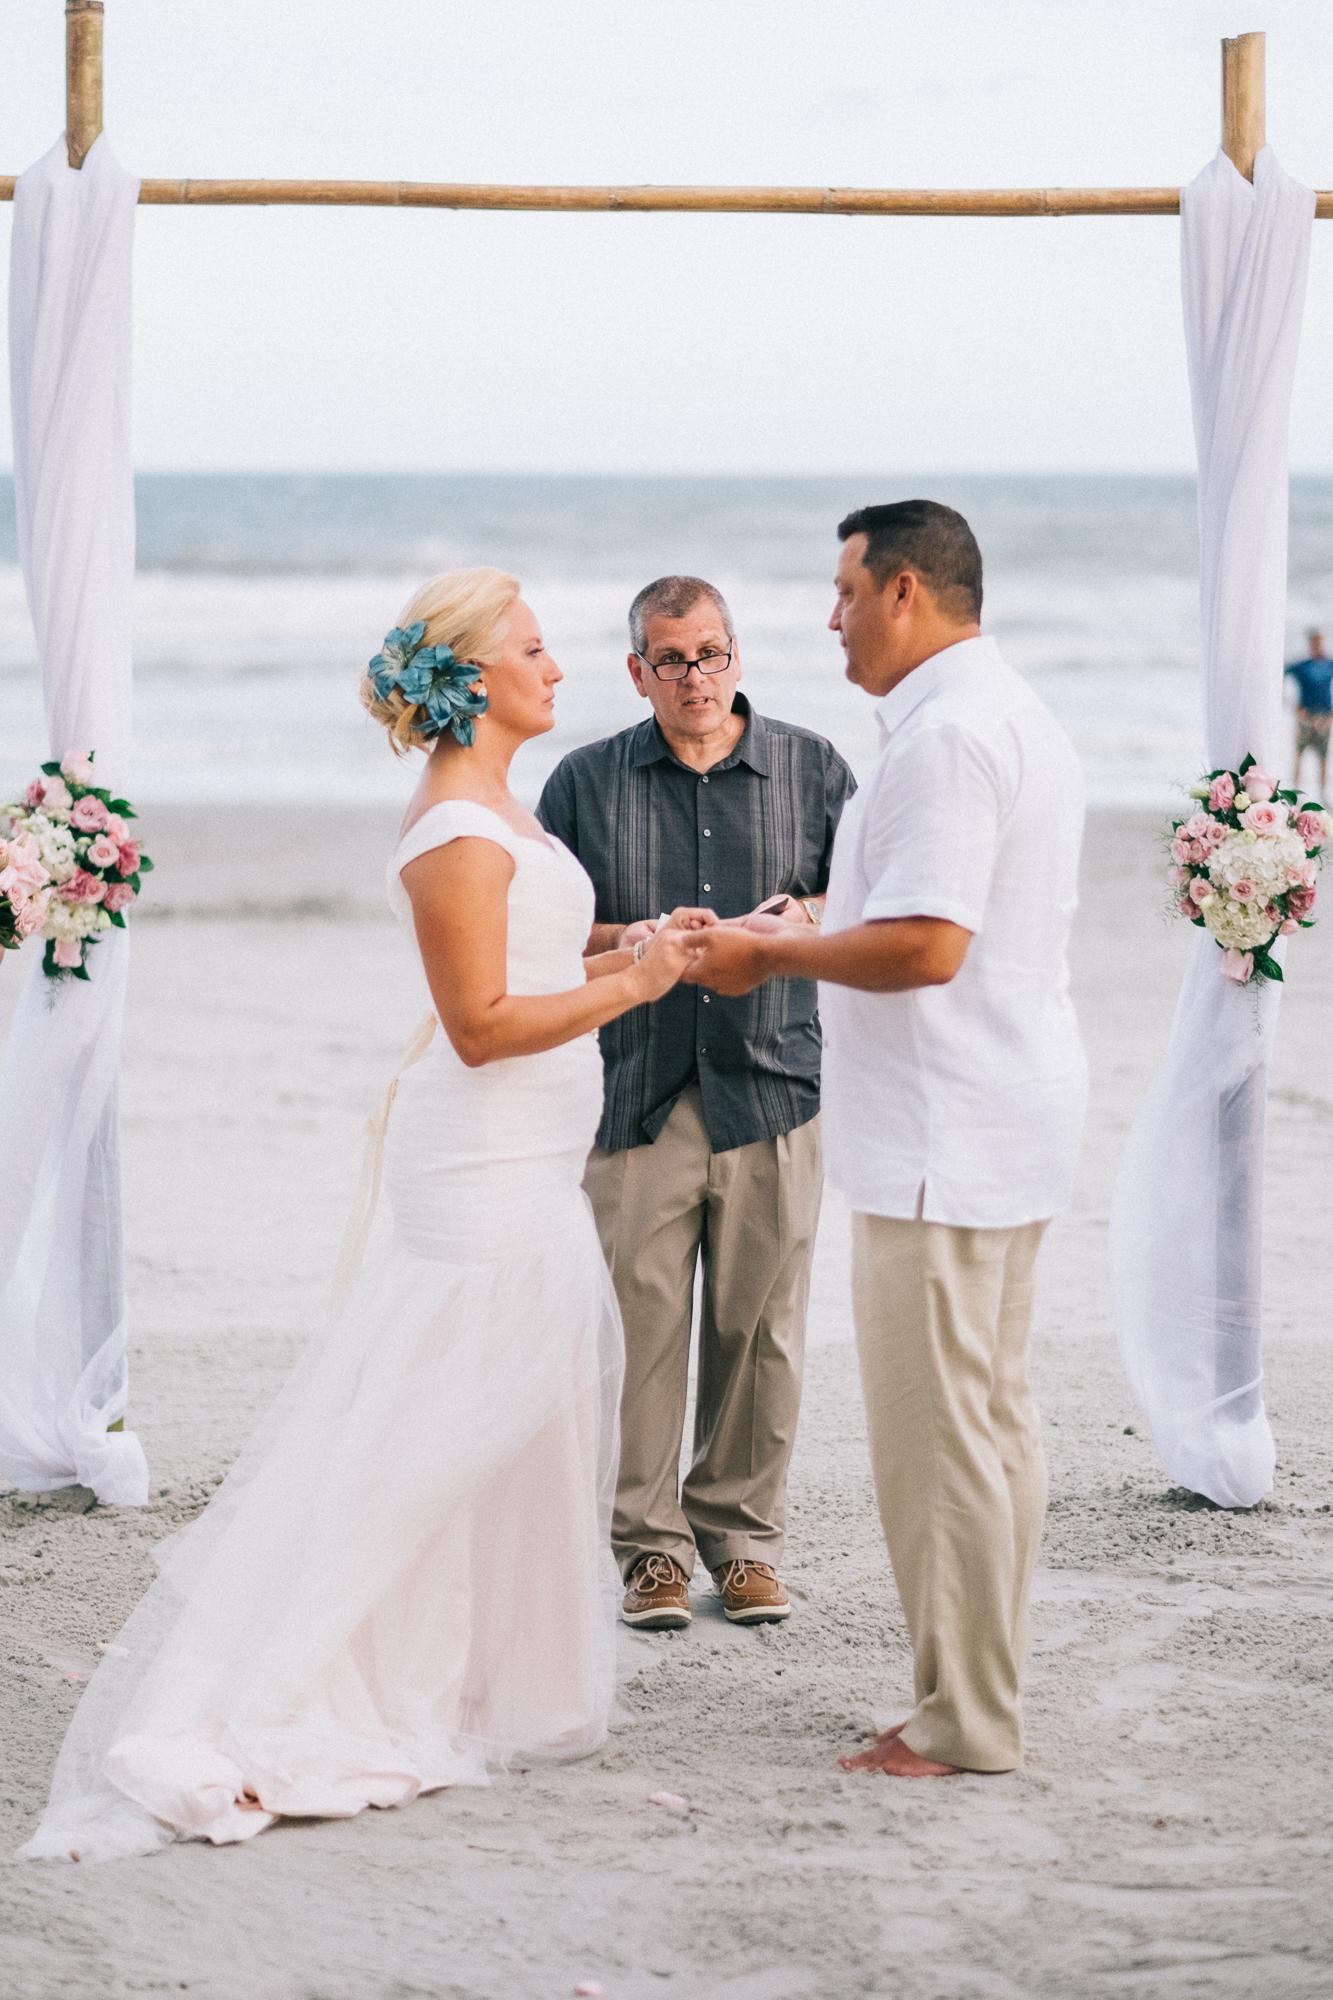 Stephanie-Mike-wedding-blog-13.jpg